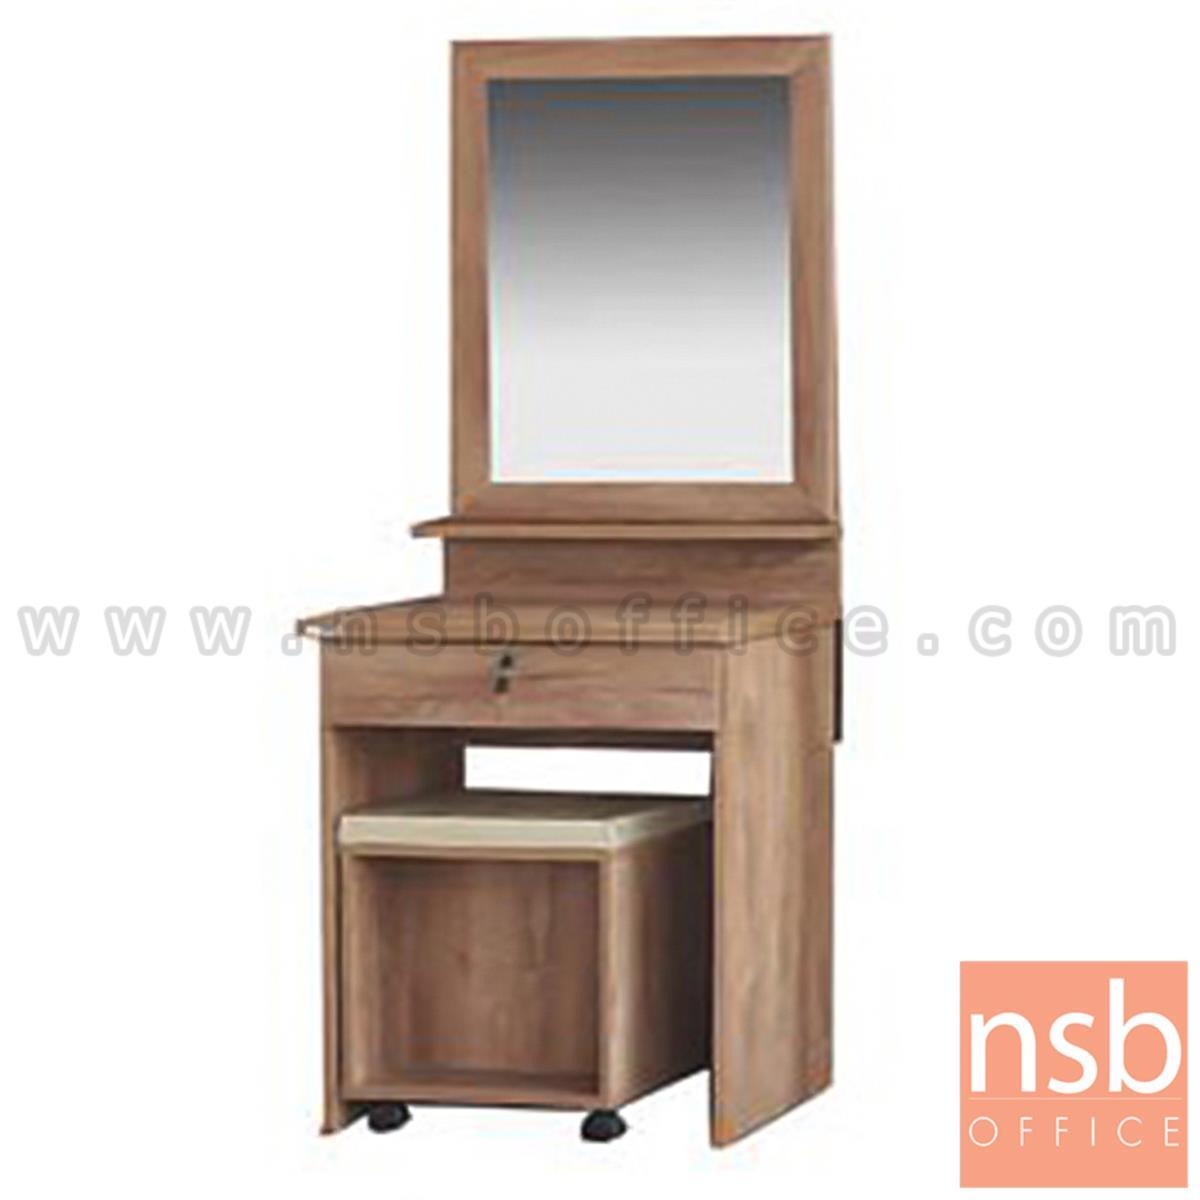 G12A277:โต๊ะเครื่องแป้งไม้ รุ่น Elleair (แอลแอร์) ขนาด 60W*160H cm. พร้อมเก้าอี้